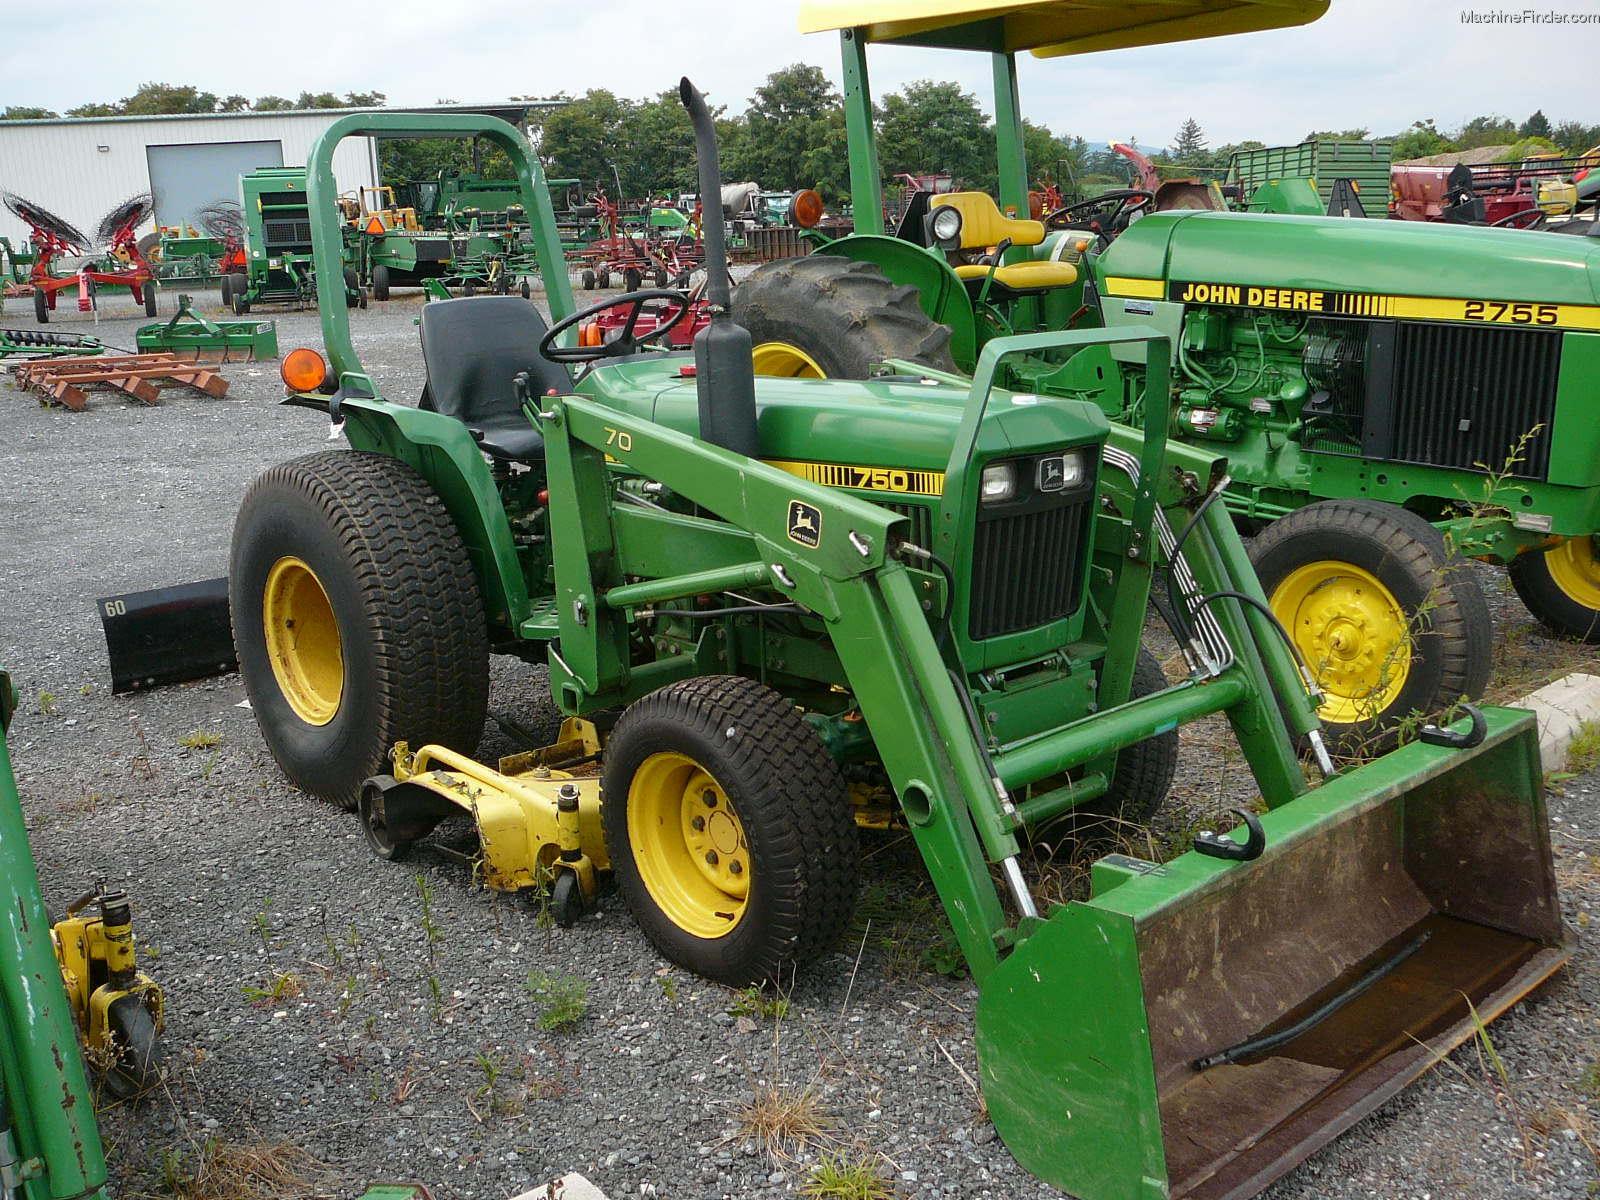 1986 John Deere 750 Tractors - Compact (1-40hp.) - John ...